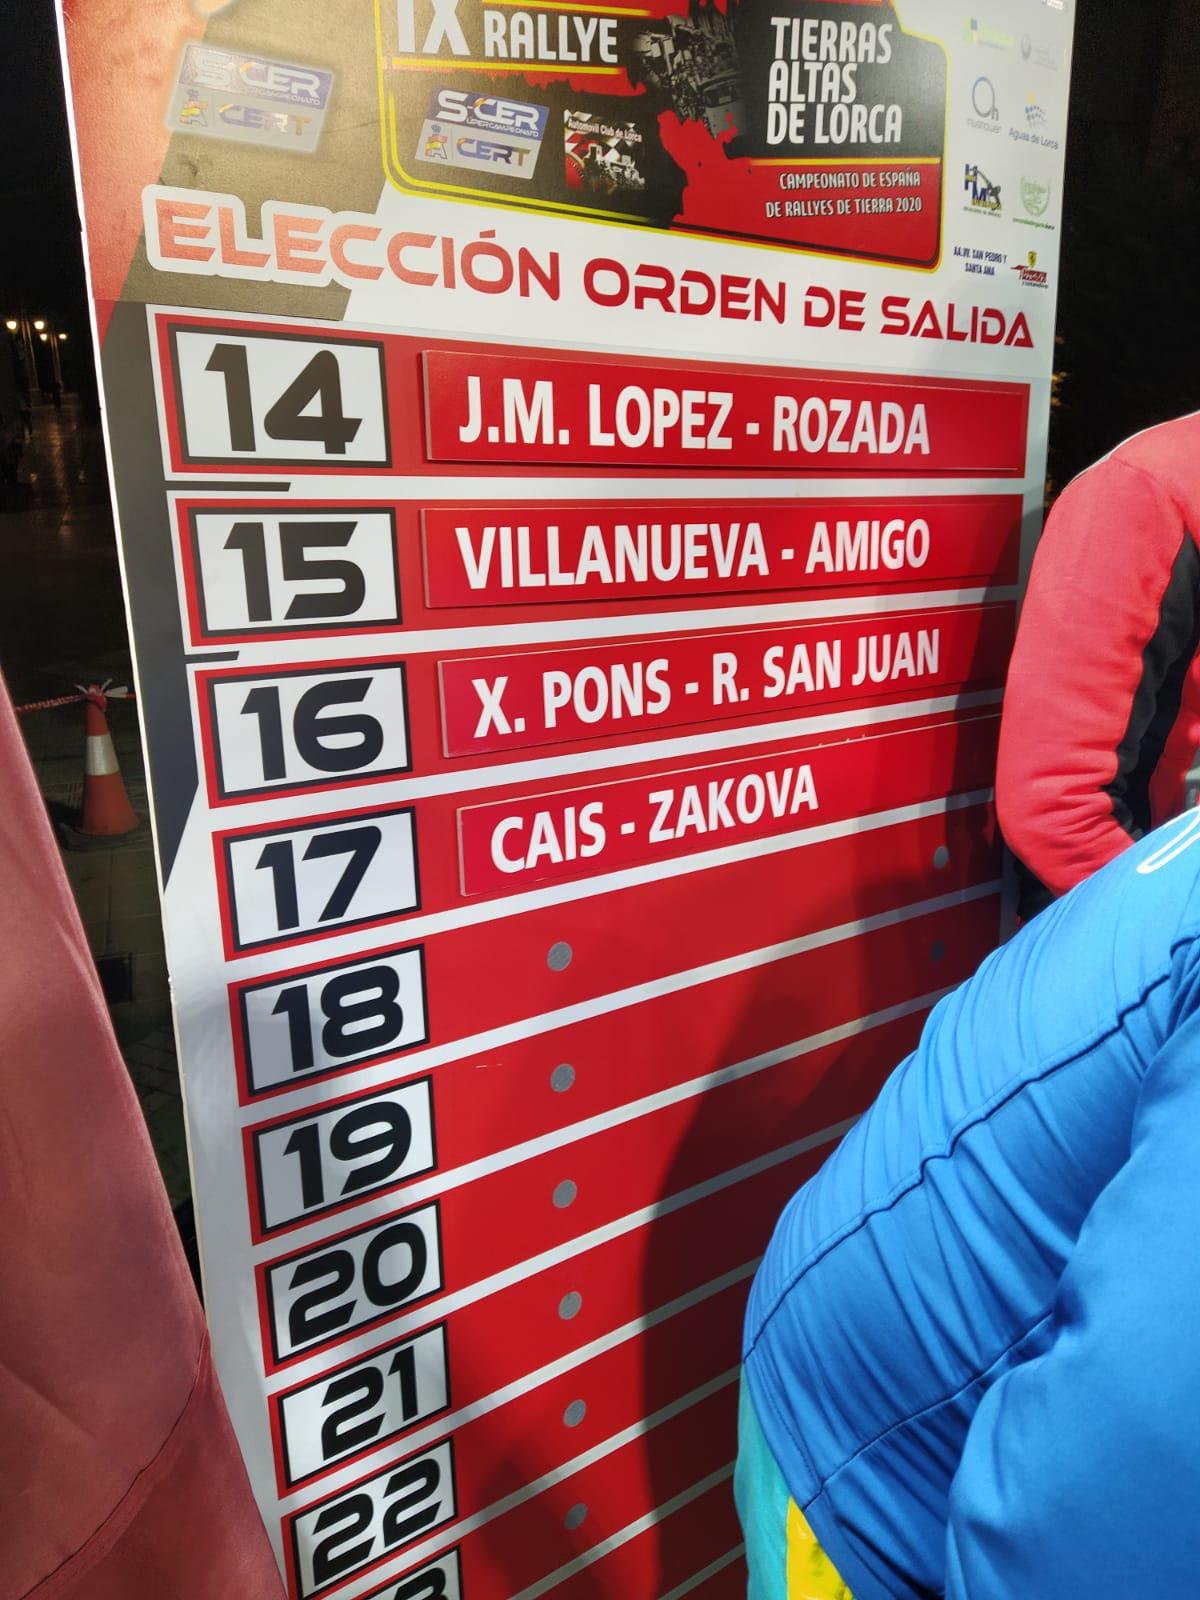 SCER + CERT: IX Rallye Tierras Altas de Lorca [6-7 Marzo] EScxXY2WoAEZn3V?format=jpg&name=large